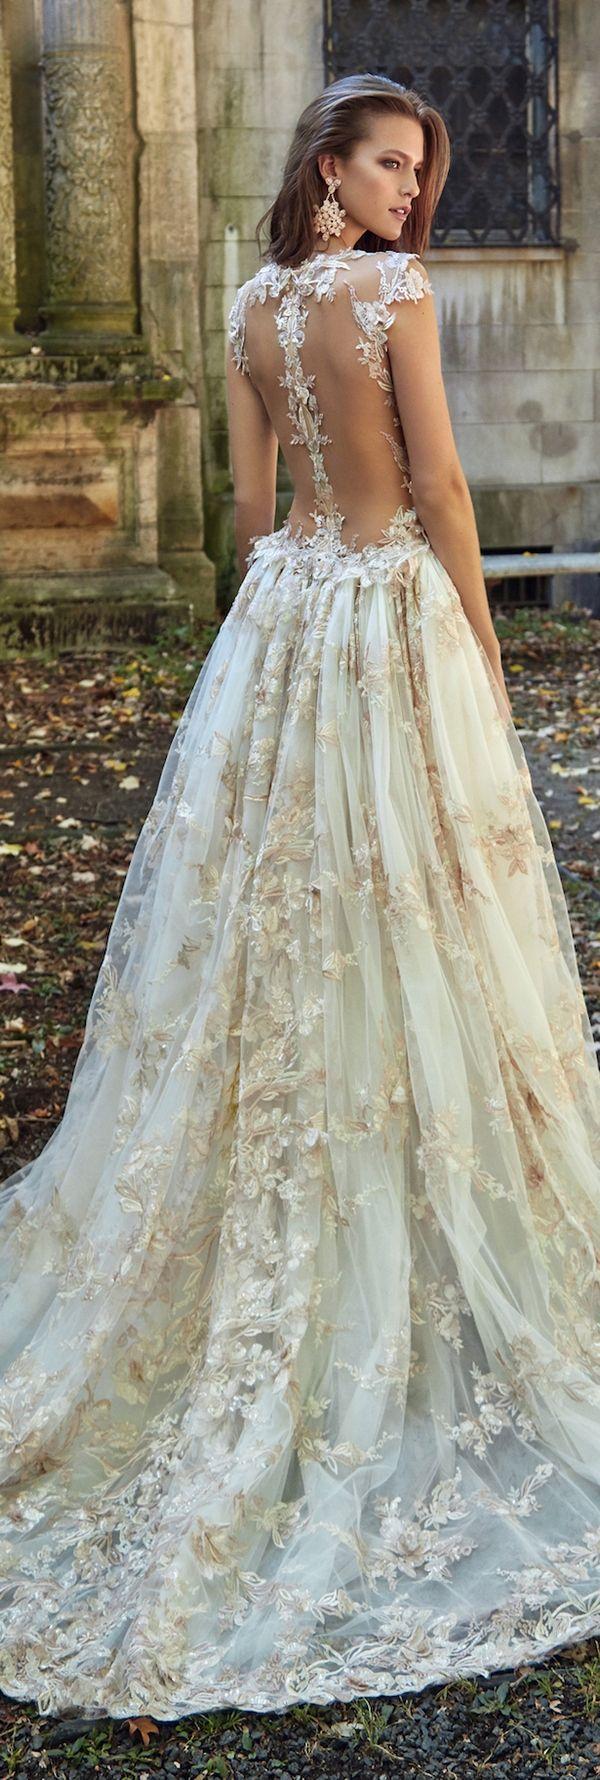 Wedding - Galia Lahav Fall 2017 Wedding Dresses – Le Secret Royal II & Gala III